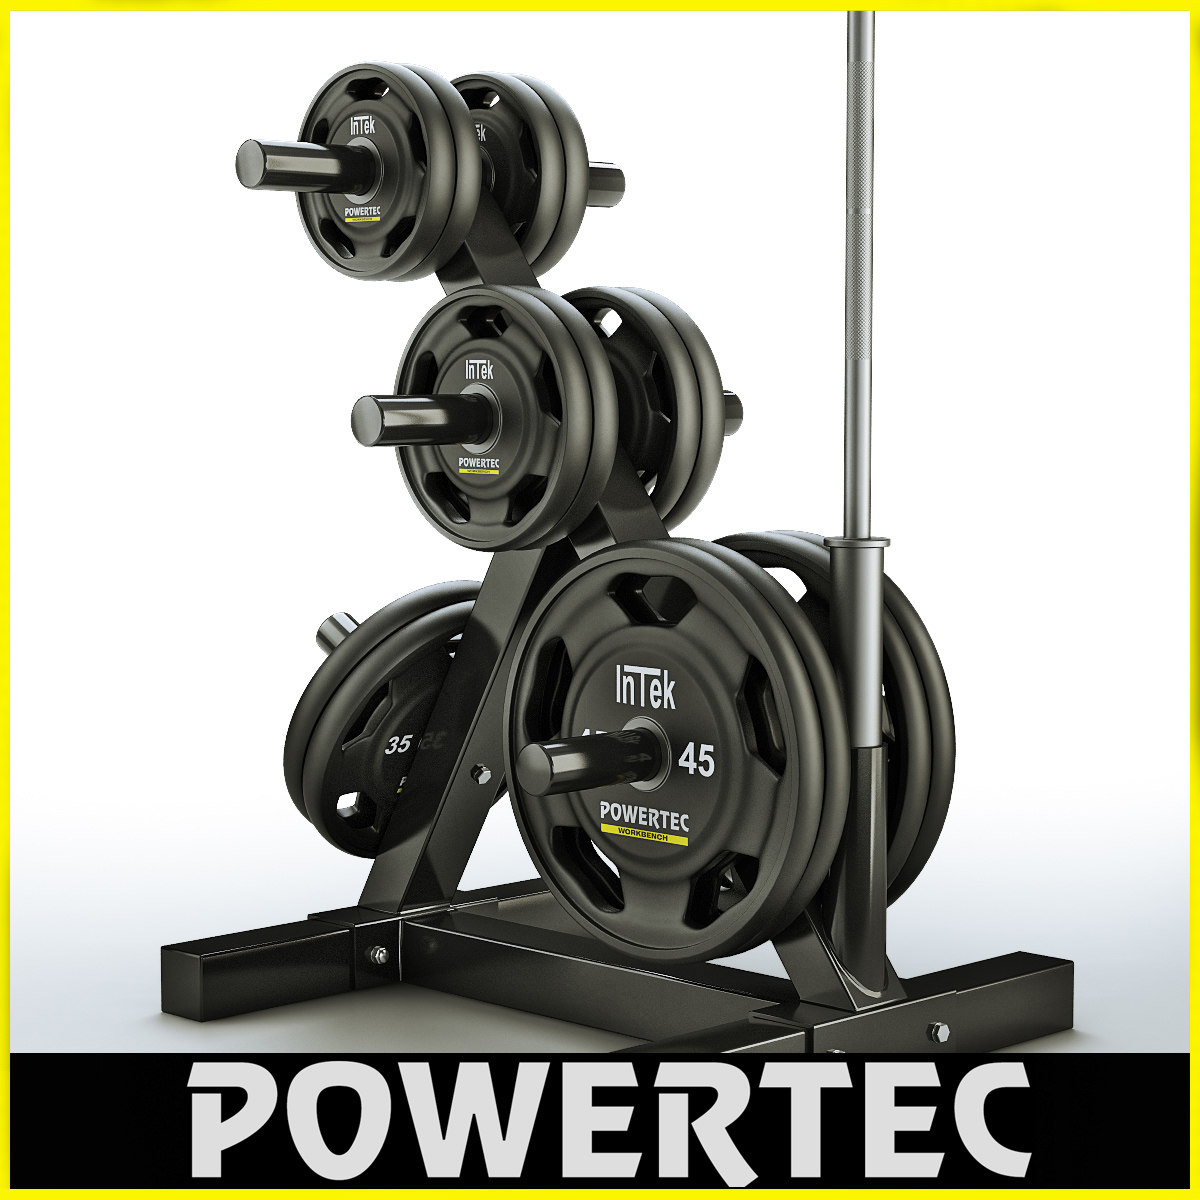 Powertec_WB-WR10_logo.jpg